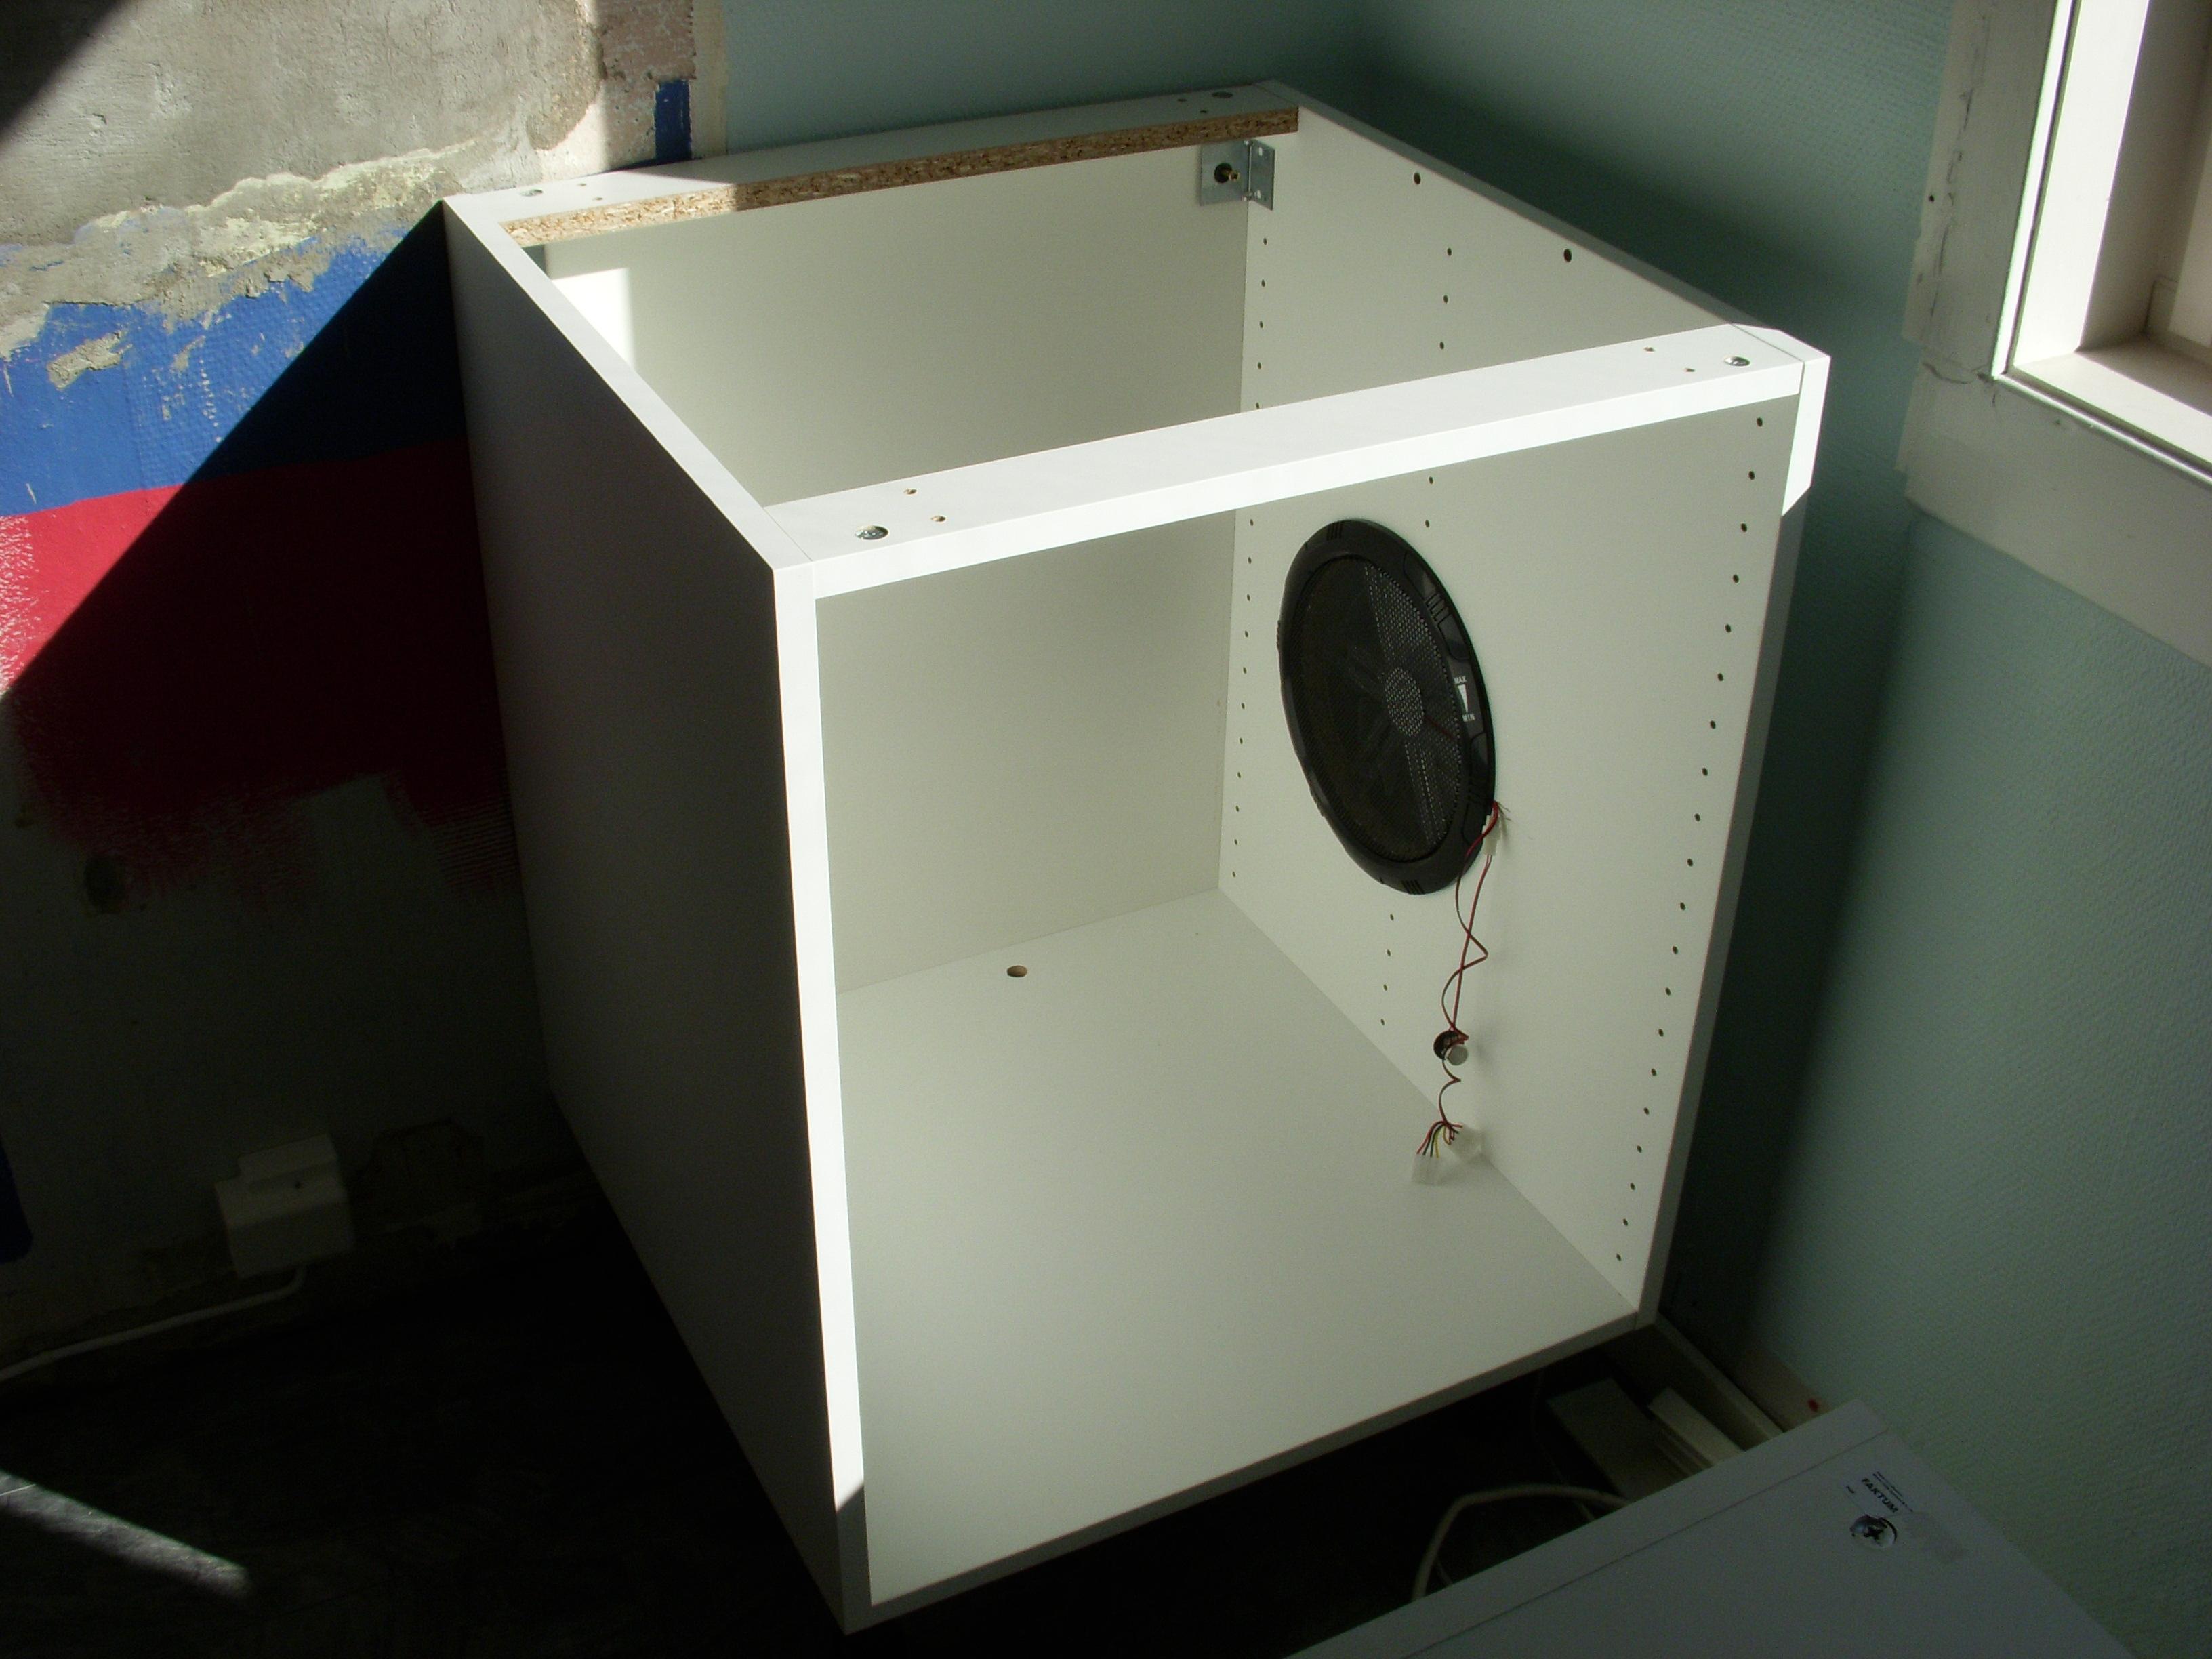 Ikea vaskemaskin interesting upraktisk kjeller with ikea for Mueble para lavadora ikea